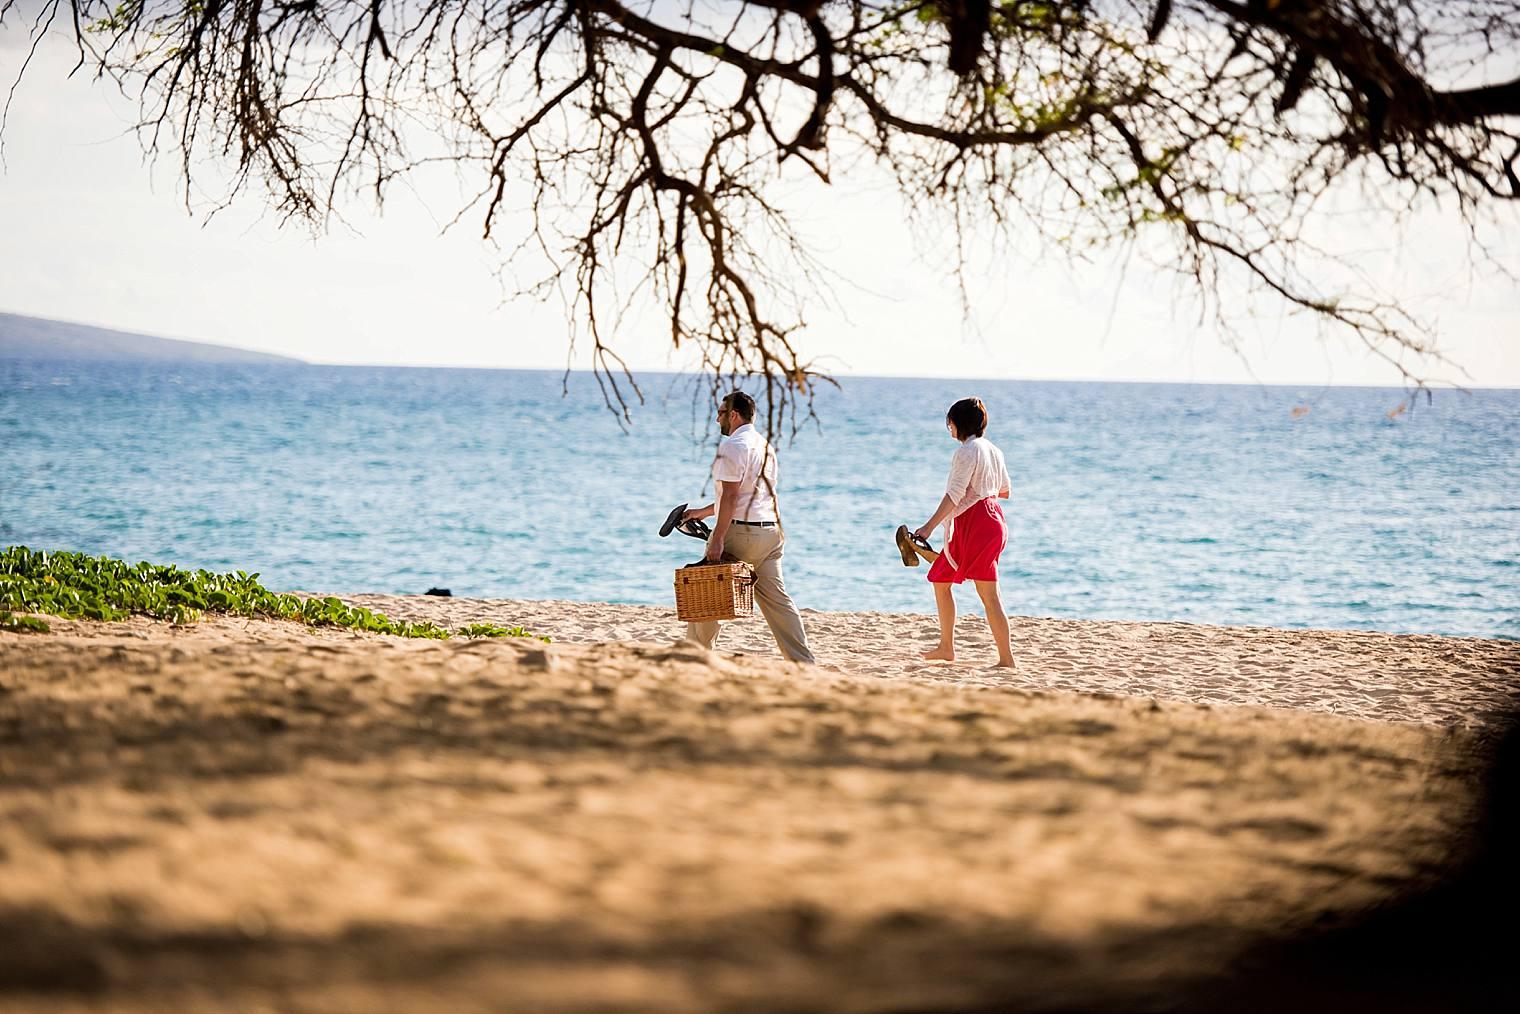 walking to beach picnic